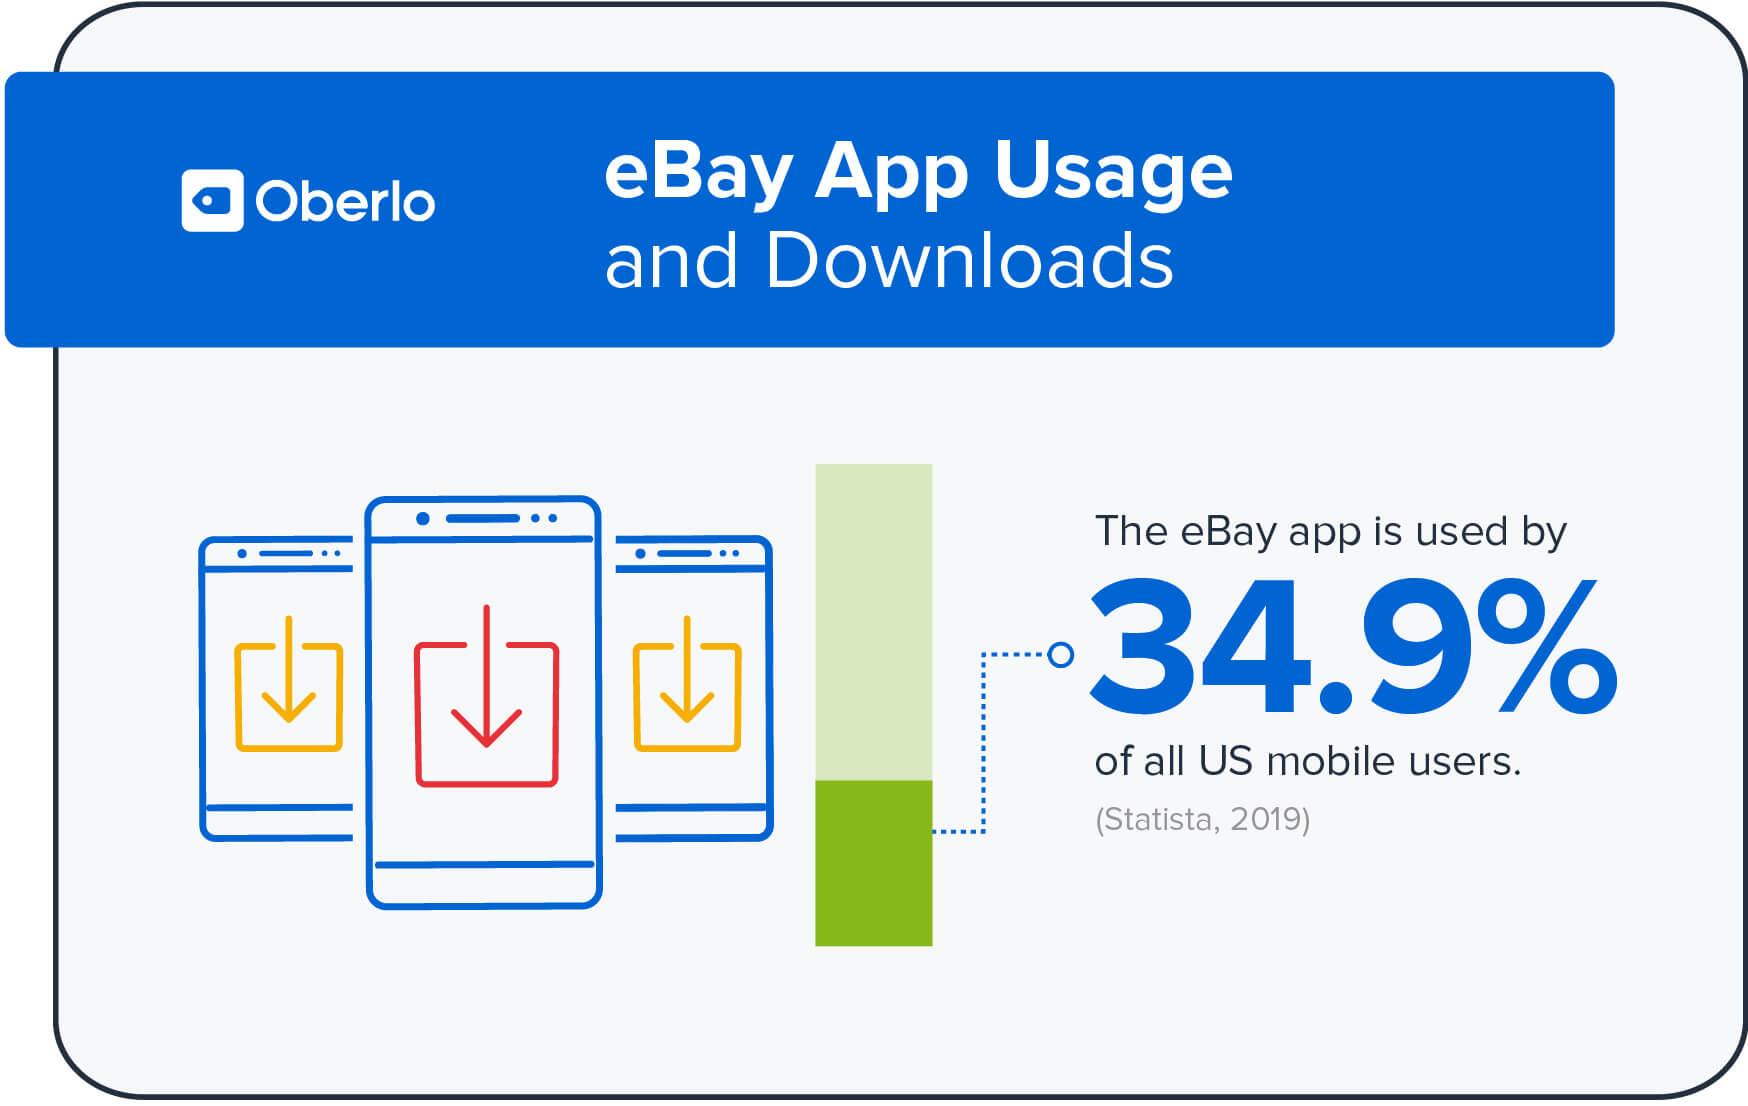 eBay mobile app users